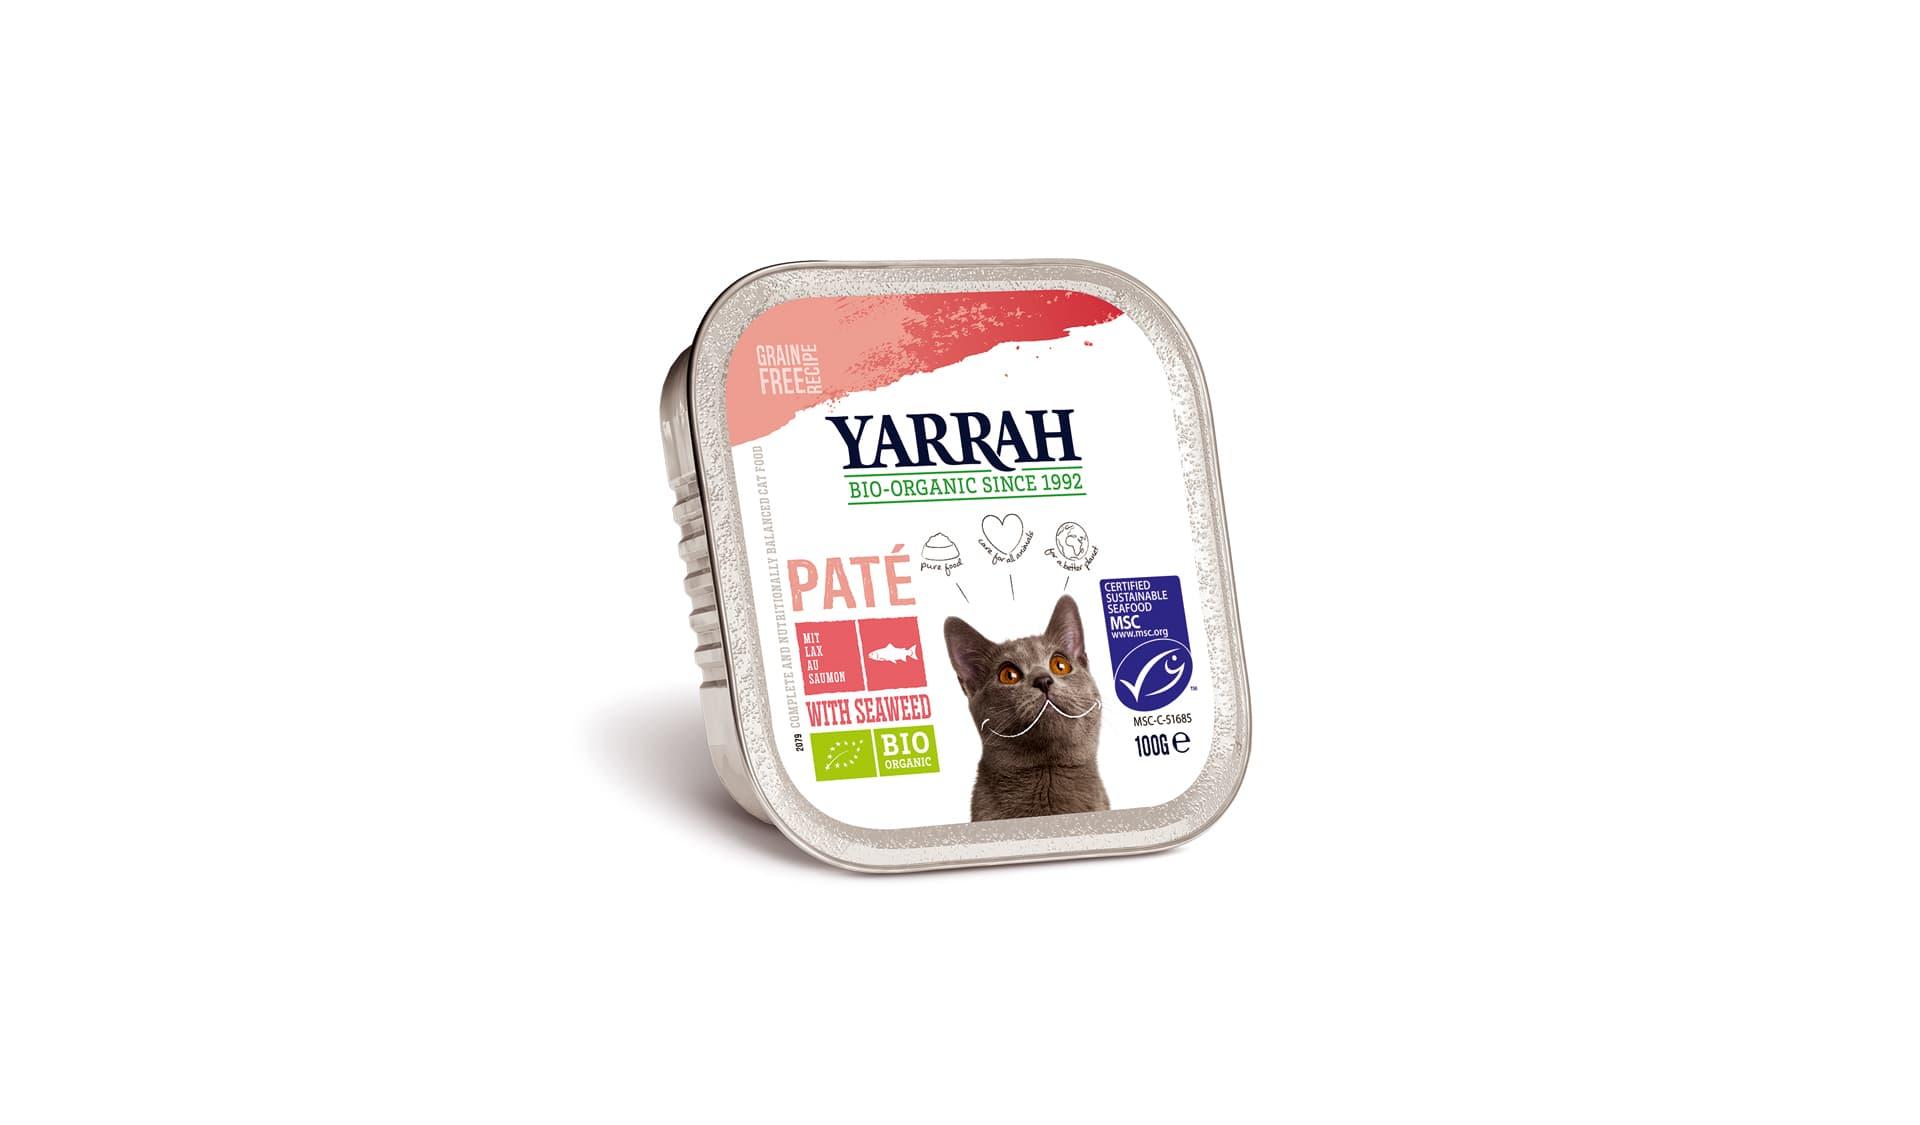 Yarrah (www.yarrah.com/de) Paté White Seaweed